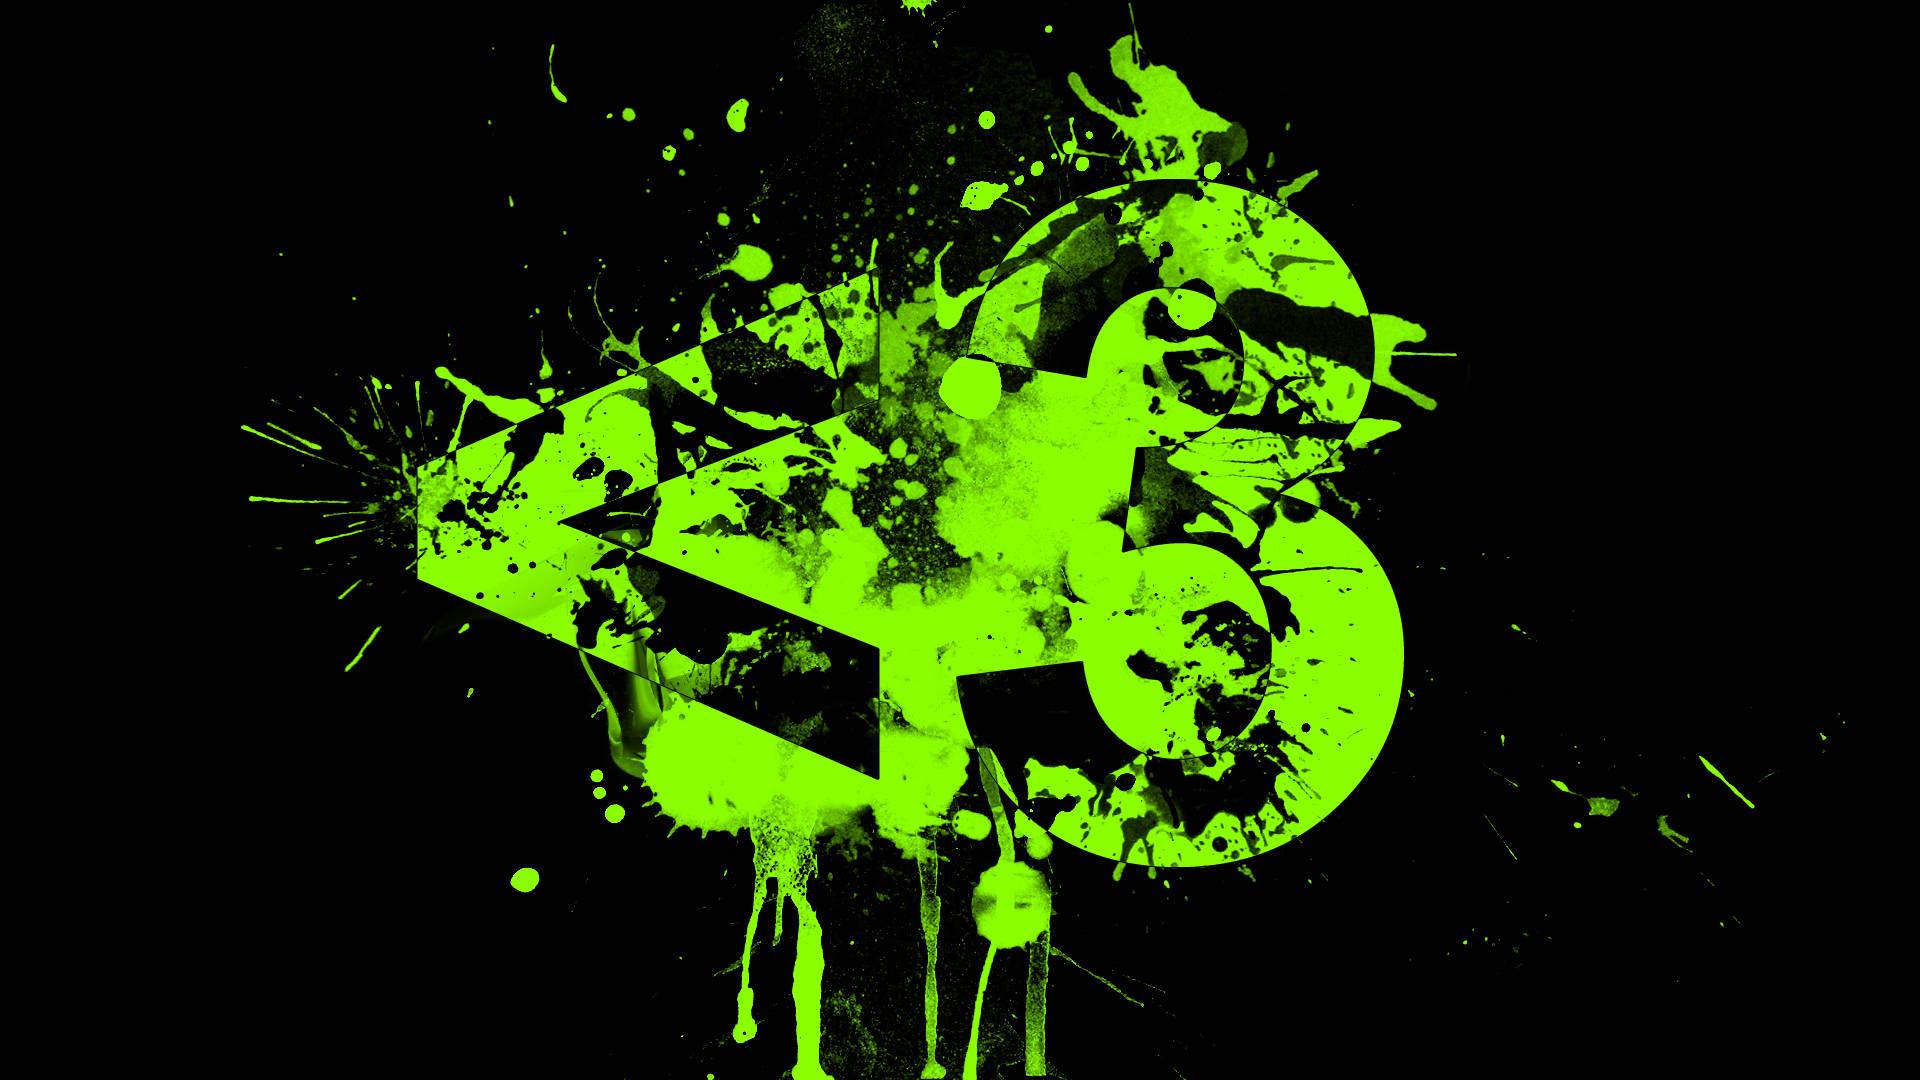 Green Black 19201080 Wallpaper 899994 1920x1080